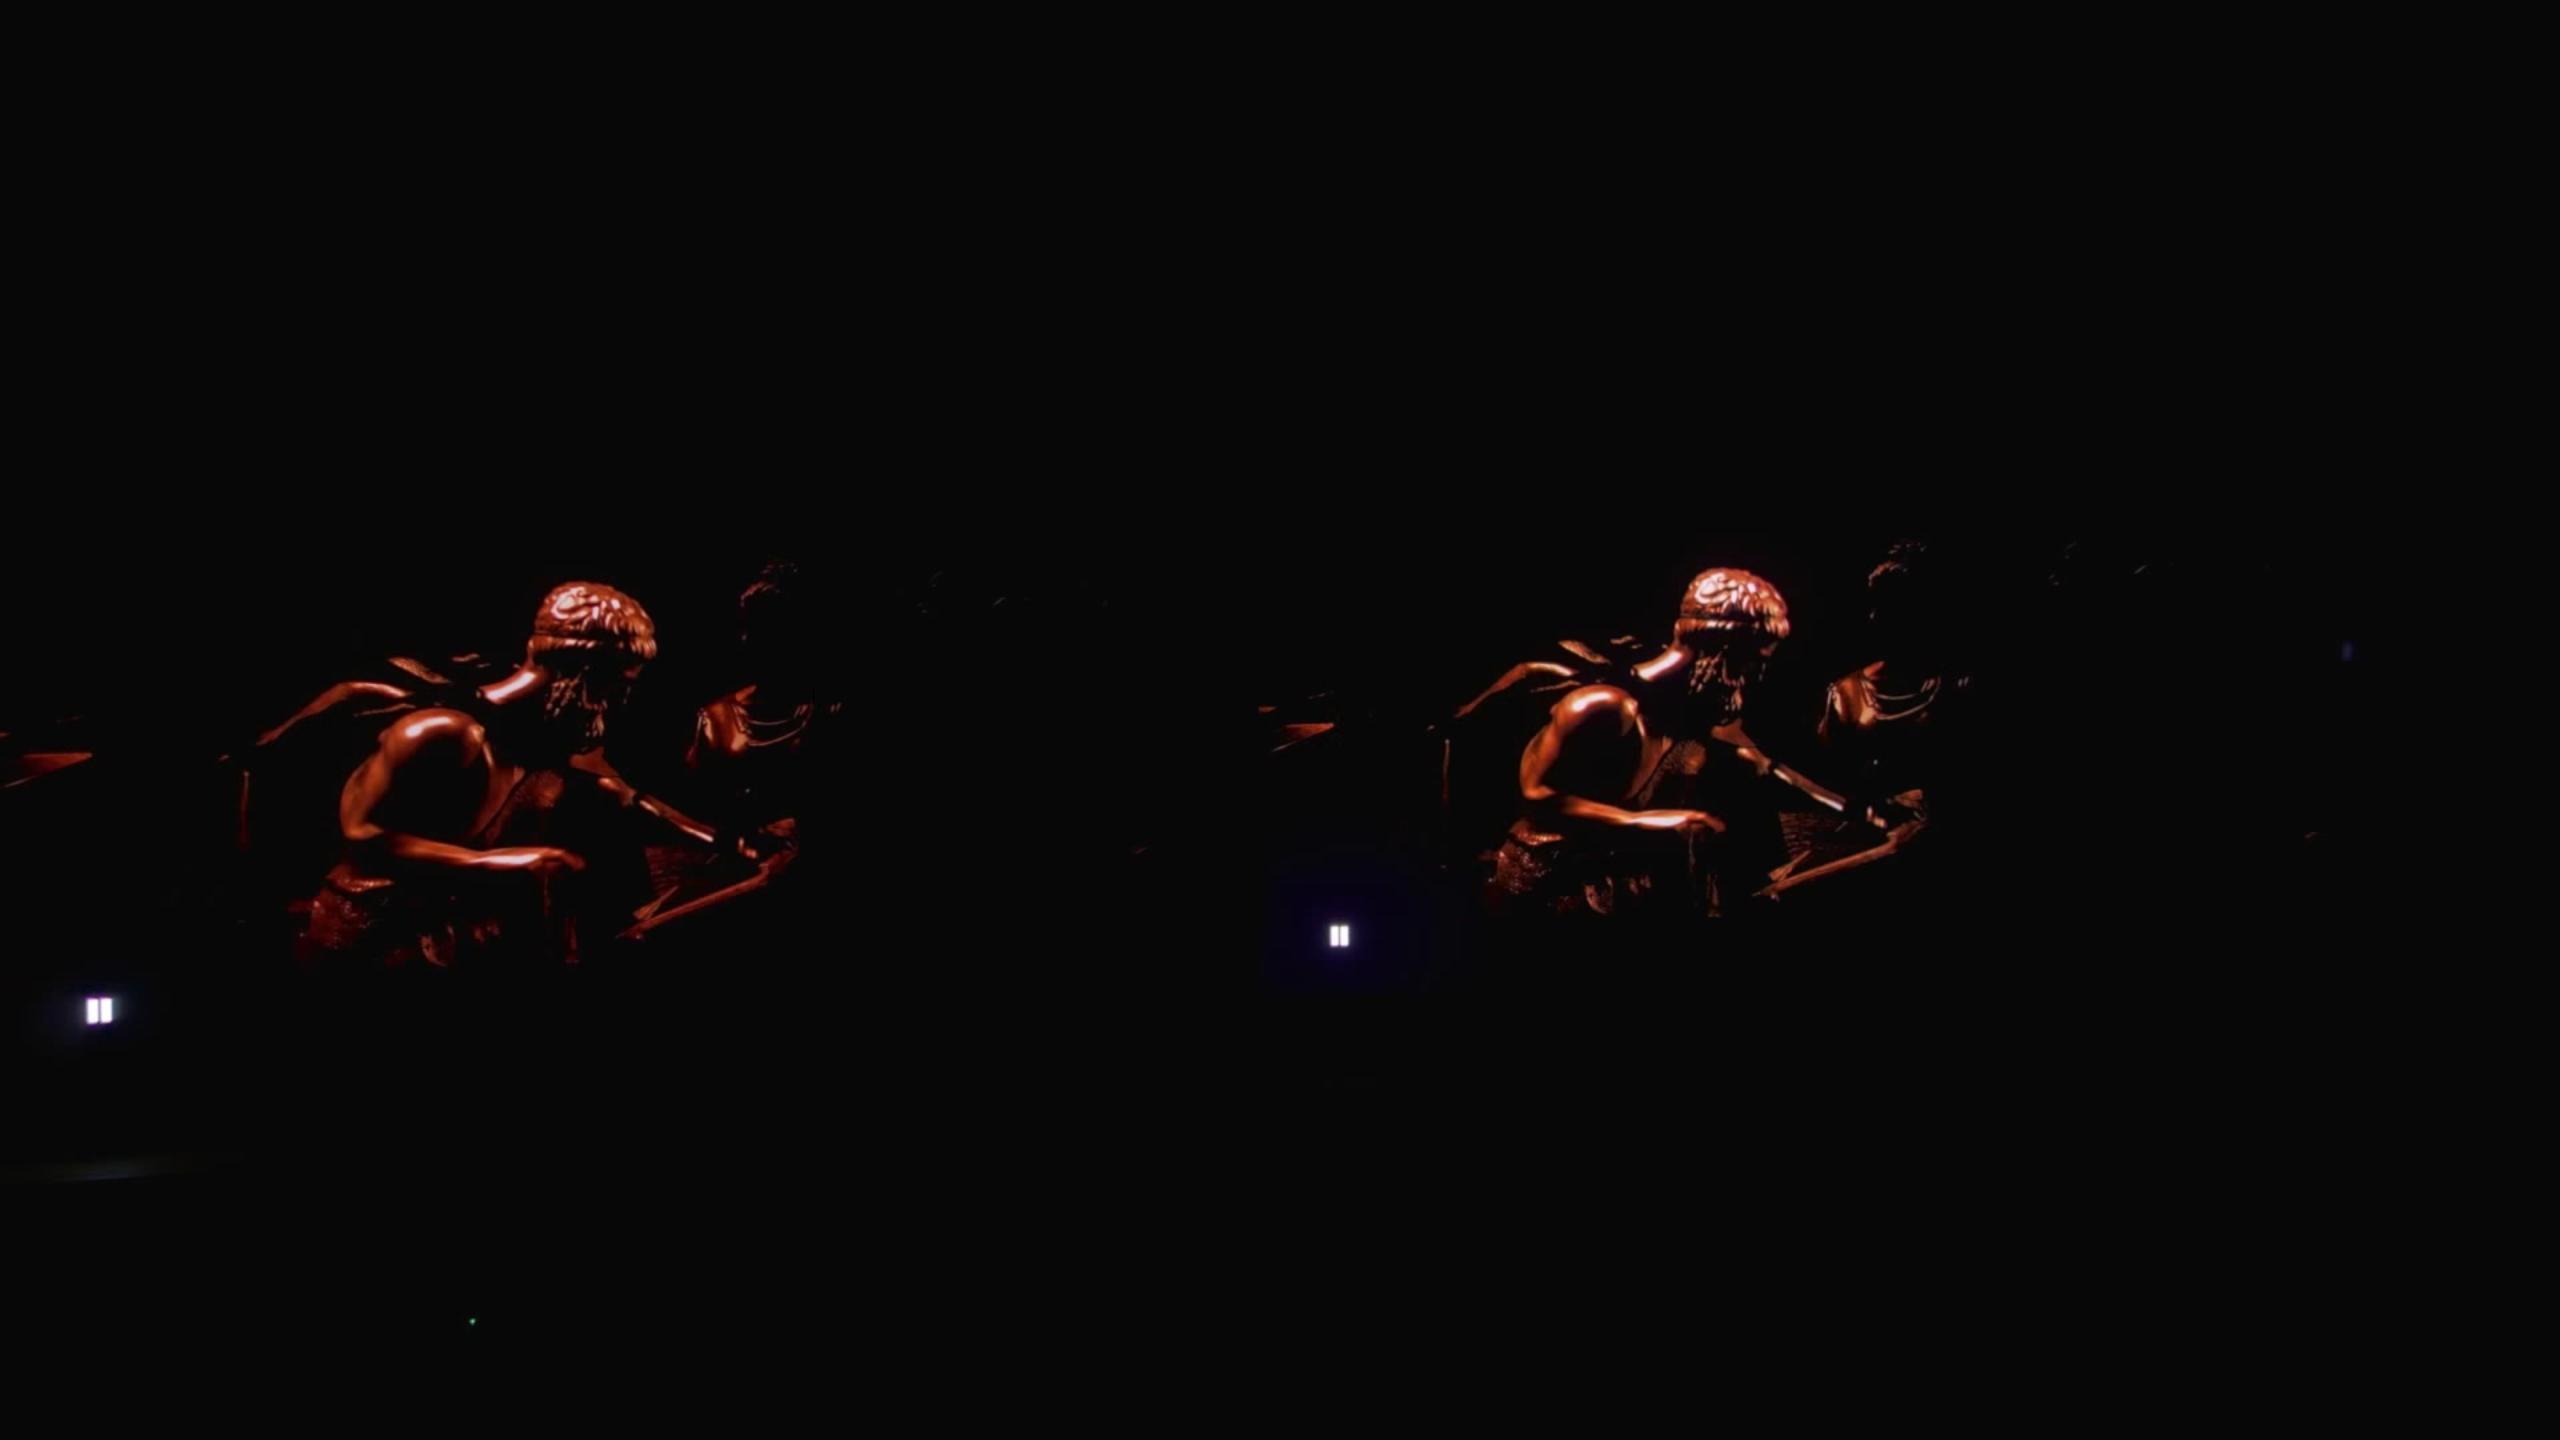 Screenshot_٢٠١٦٠٦٢٧-٢٣٥٦٤١